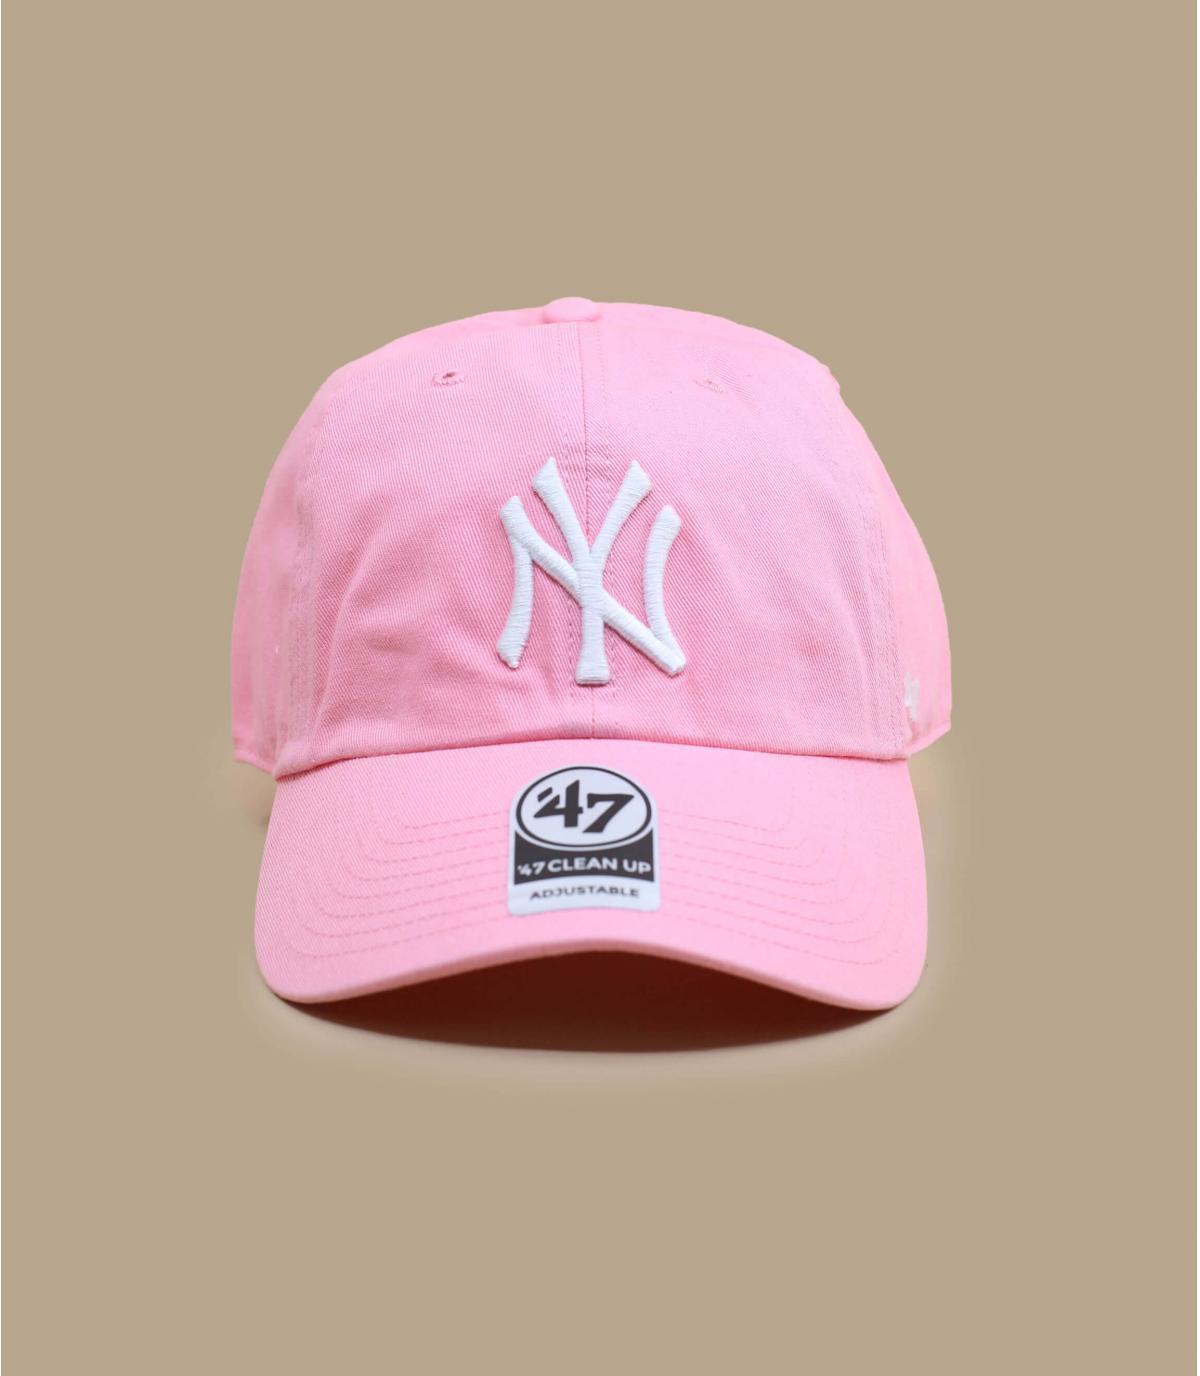 Detalles Clean Up NY pink imagen 2